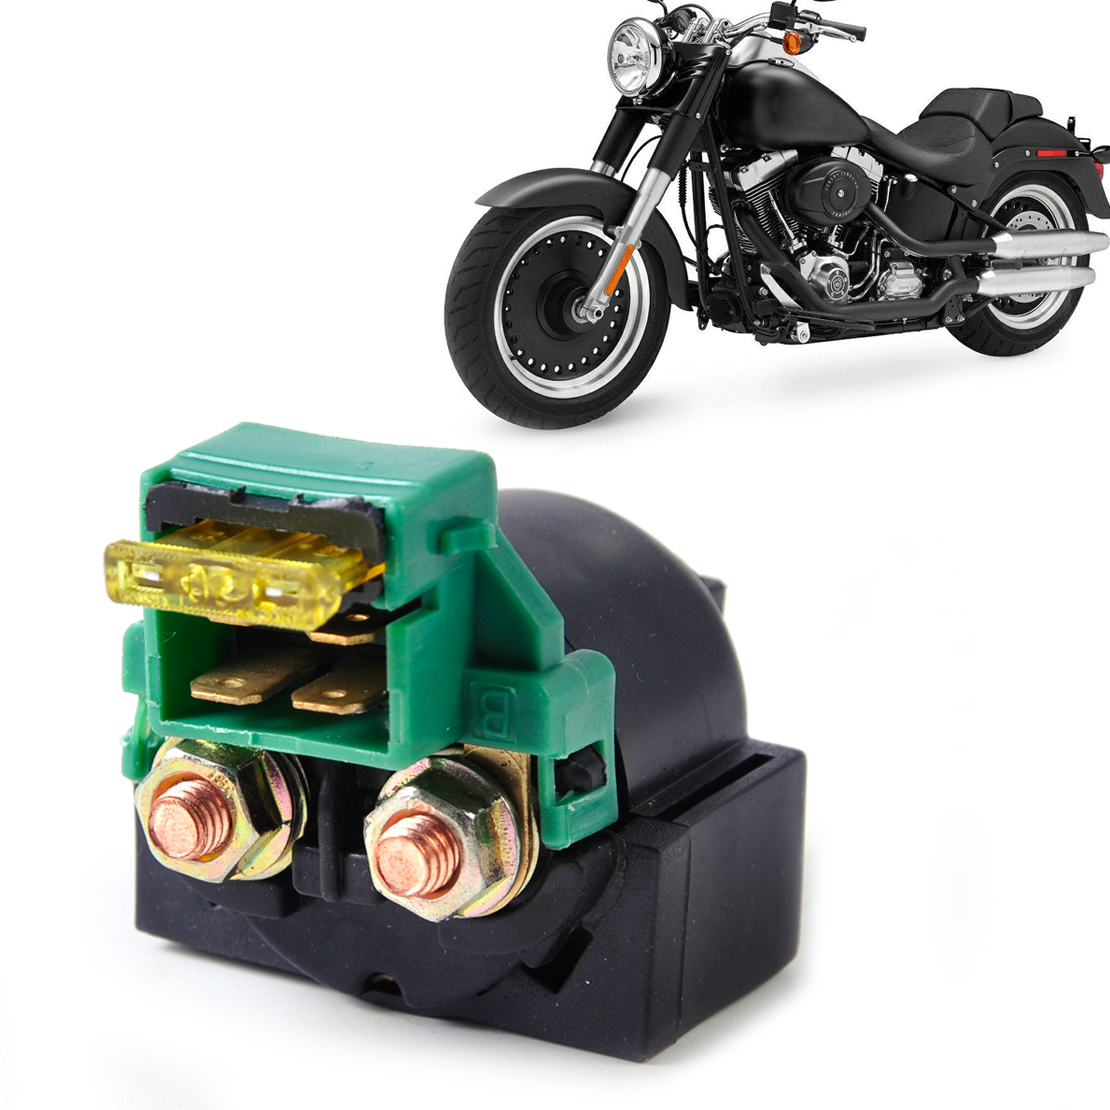 Dwcx Motorcycle Starter Relay Solenoid Ignition For Kawasaki 1988 Toyota Pickup Zx60ninja 60r 1989 1991991 1992 1993 1994 1997 In Motorbike Ingition From